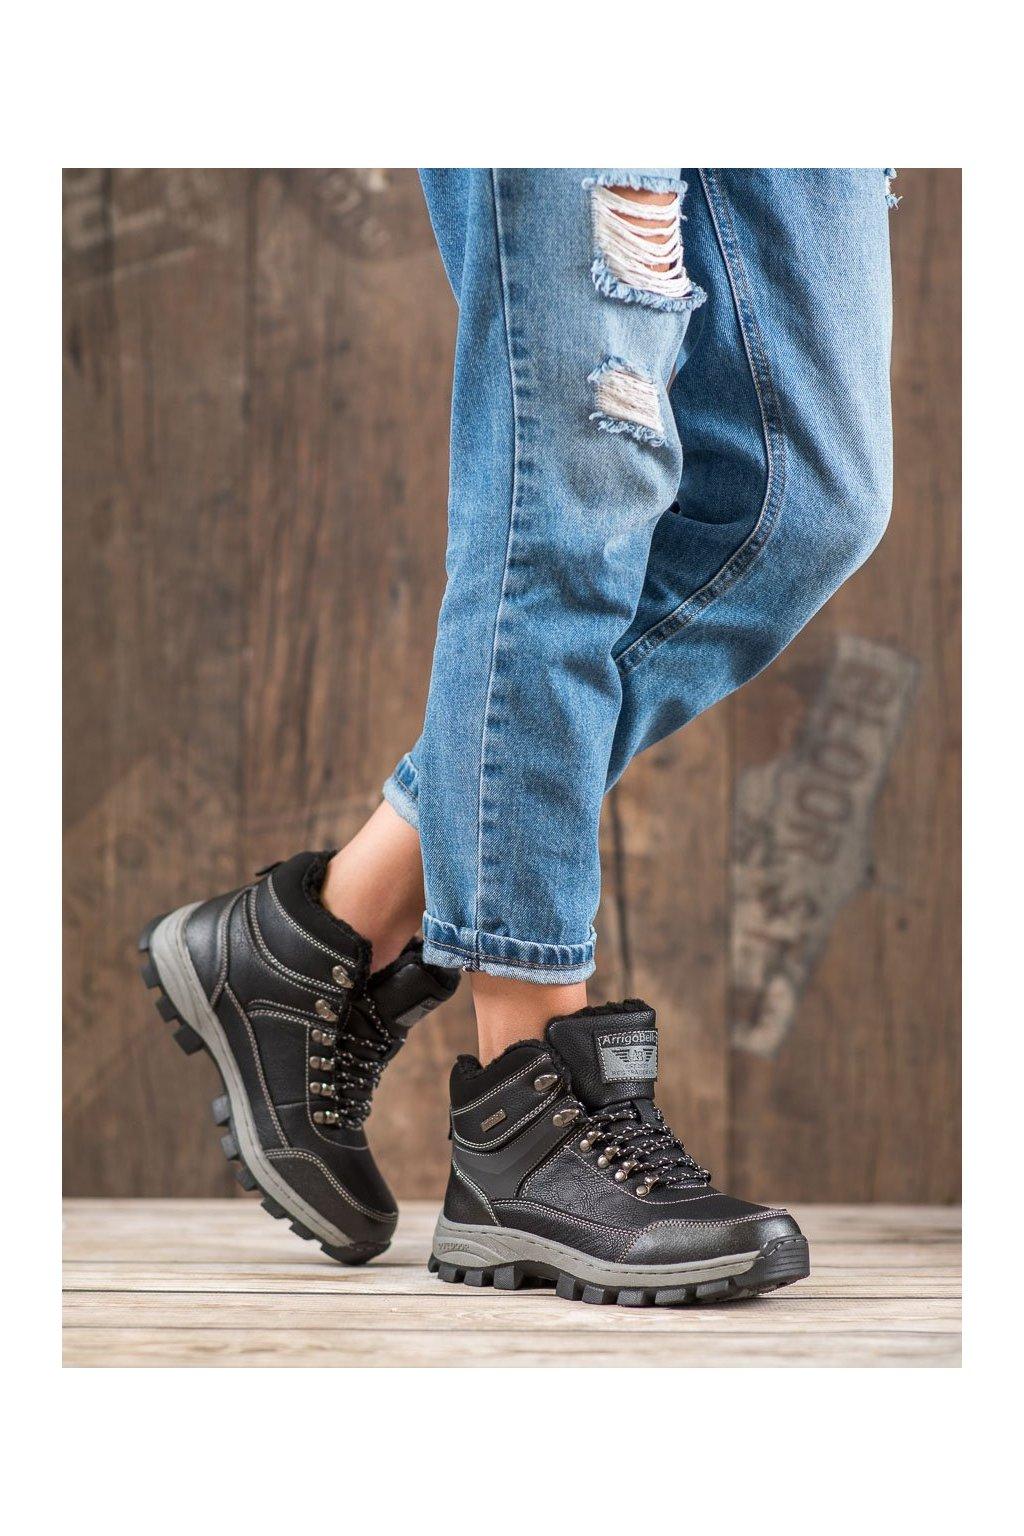 Čierne dámske topánky Arrigo bello kod BM98493B